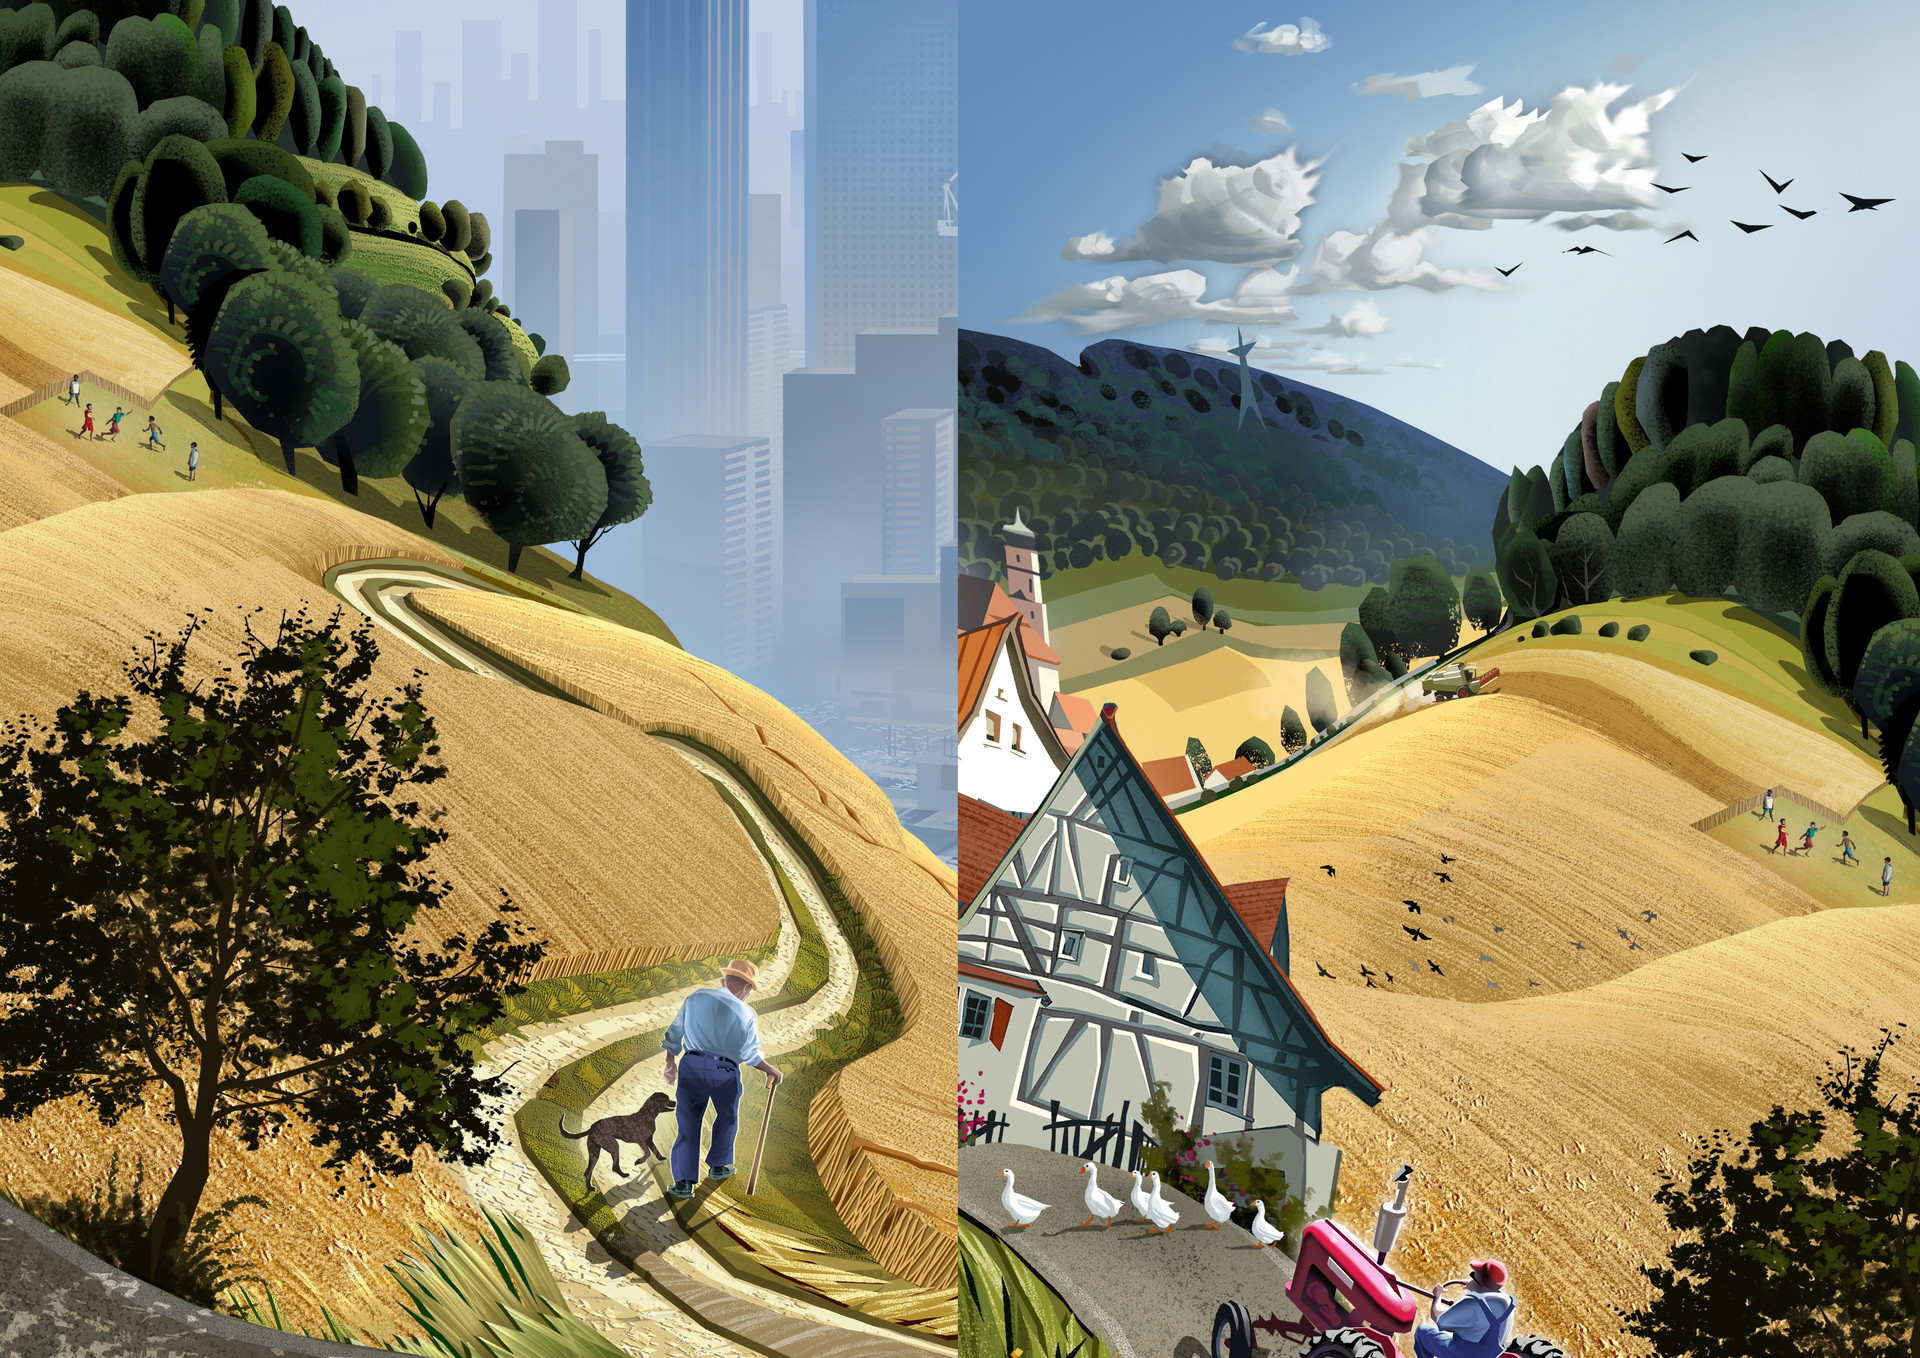 Harald ardeias countryside to megacity detail 1